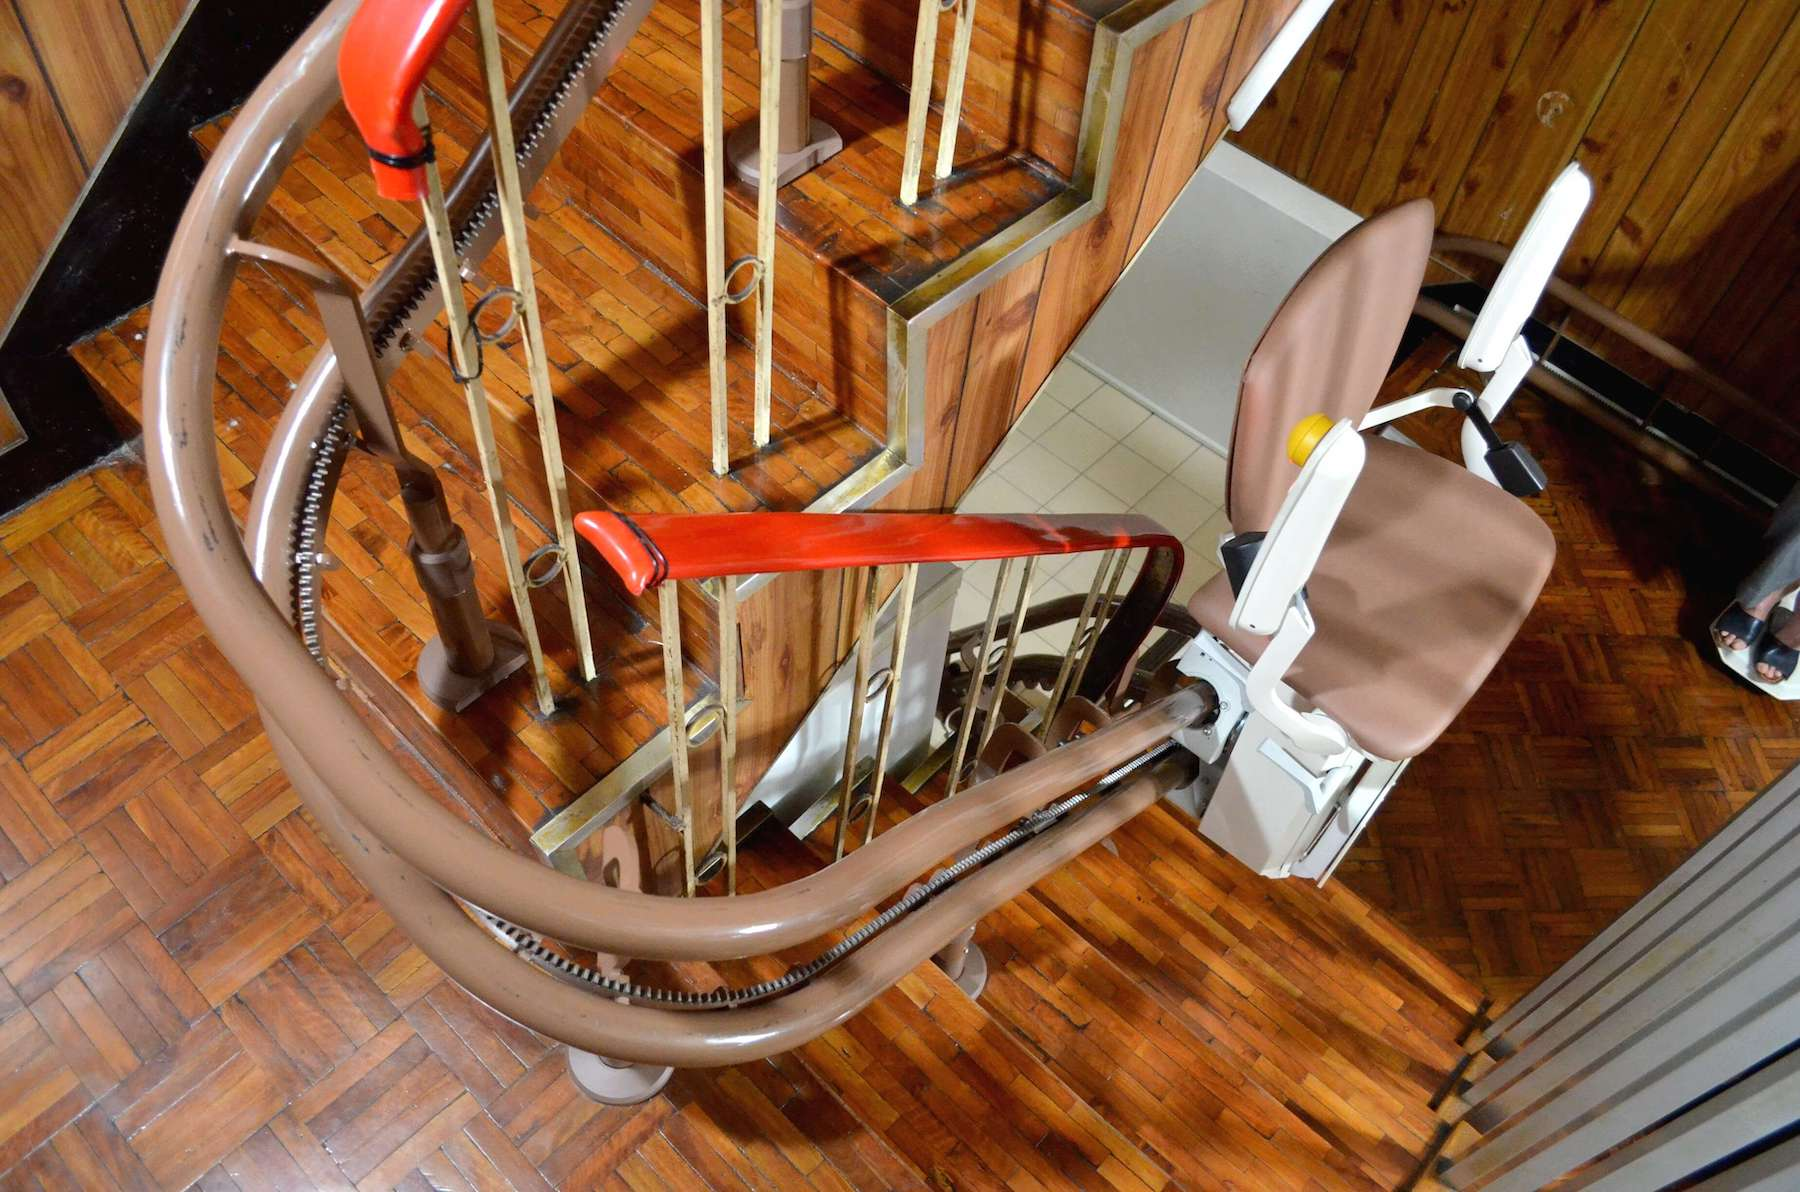 Otolift彎曲型樓梯升降椅,坐著上下樓梯